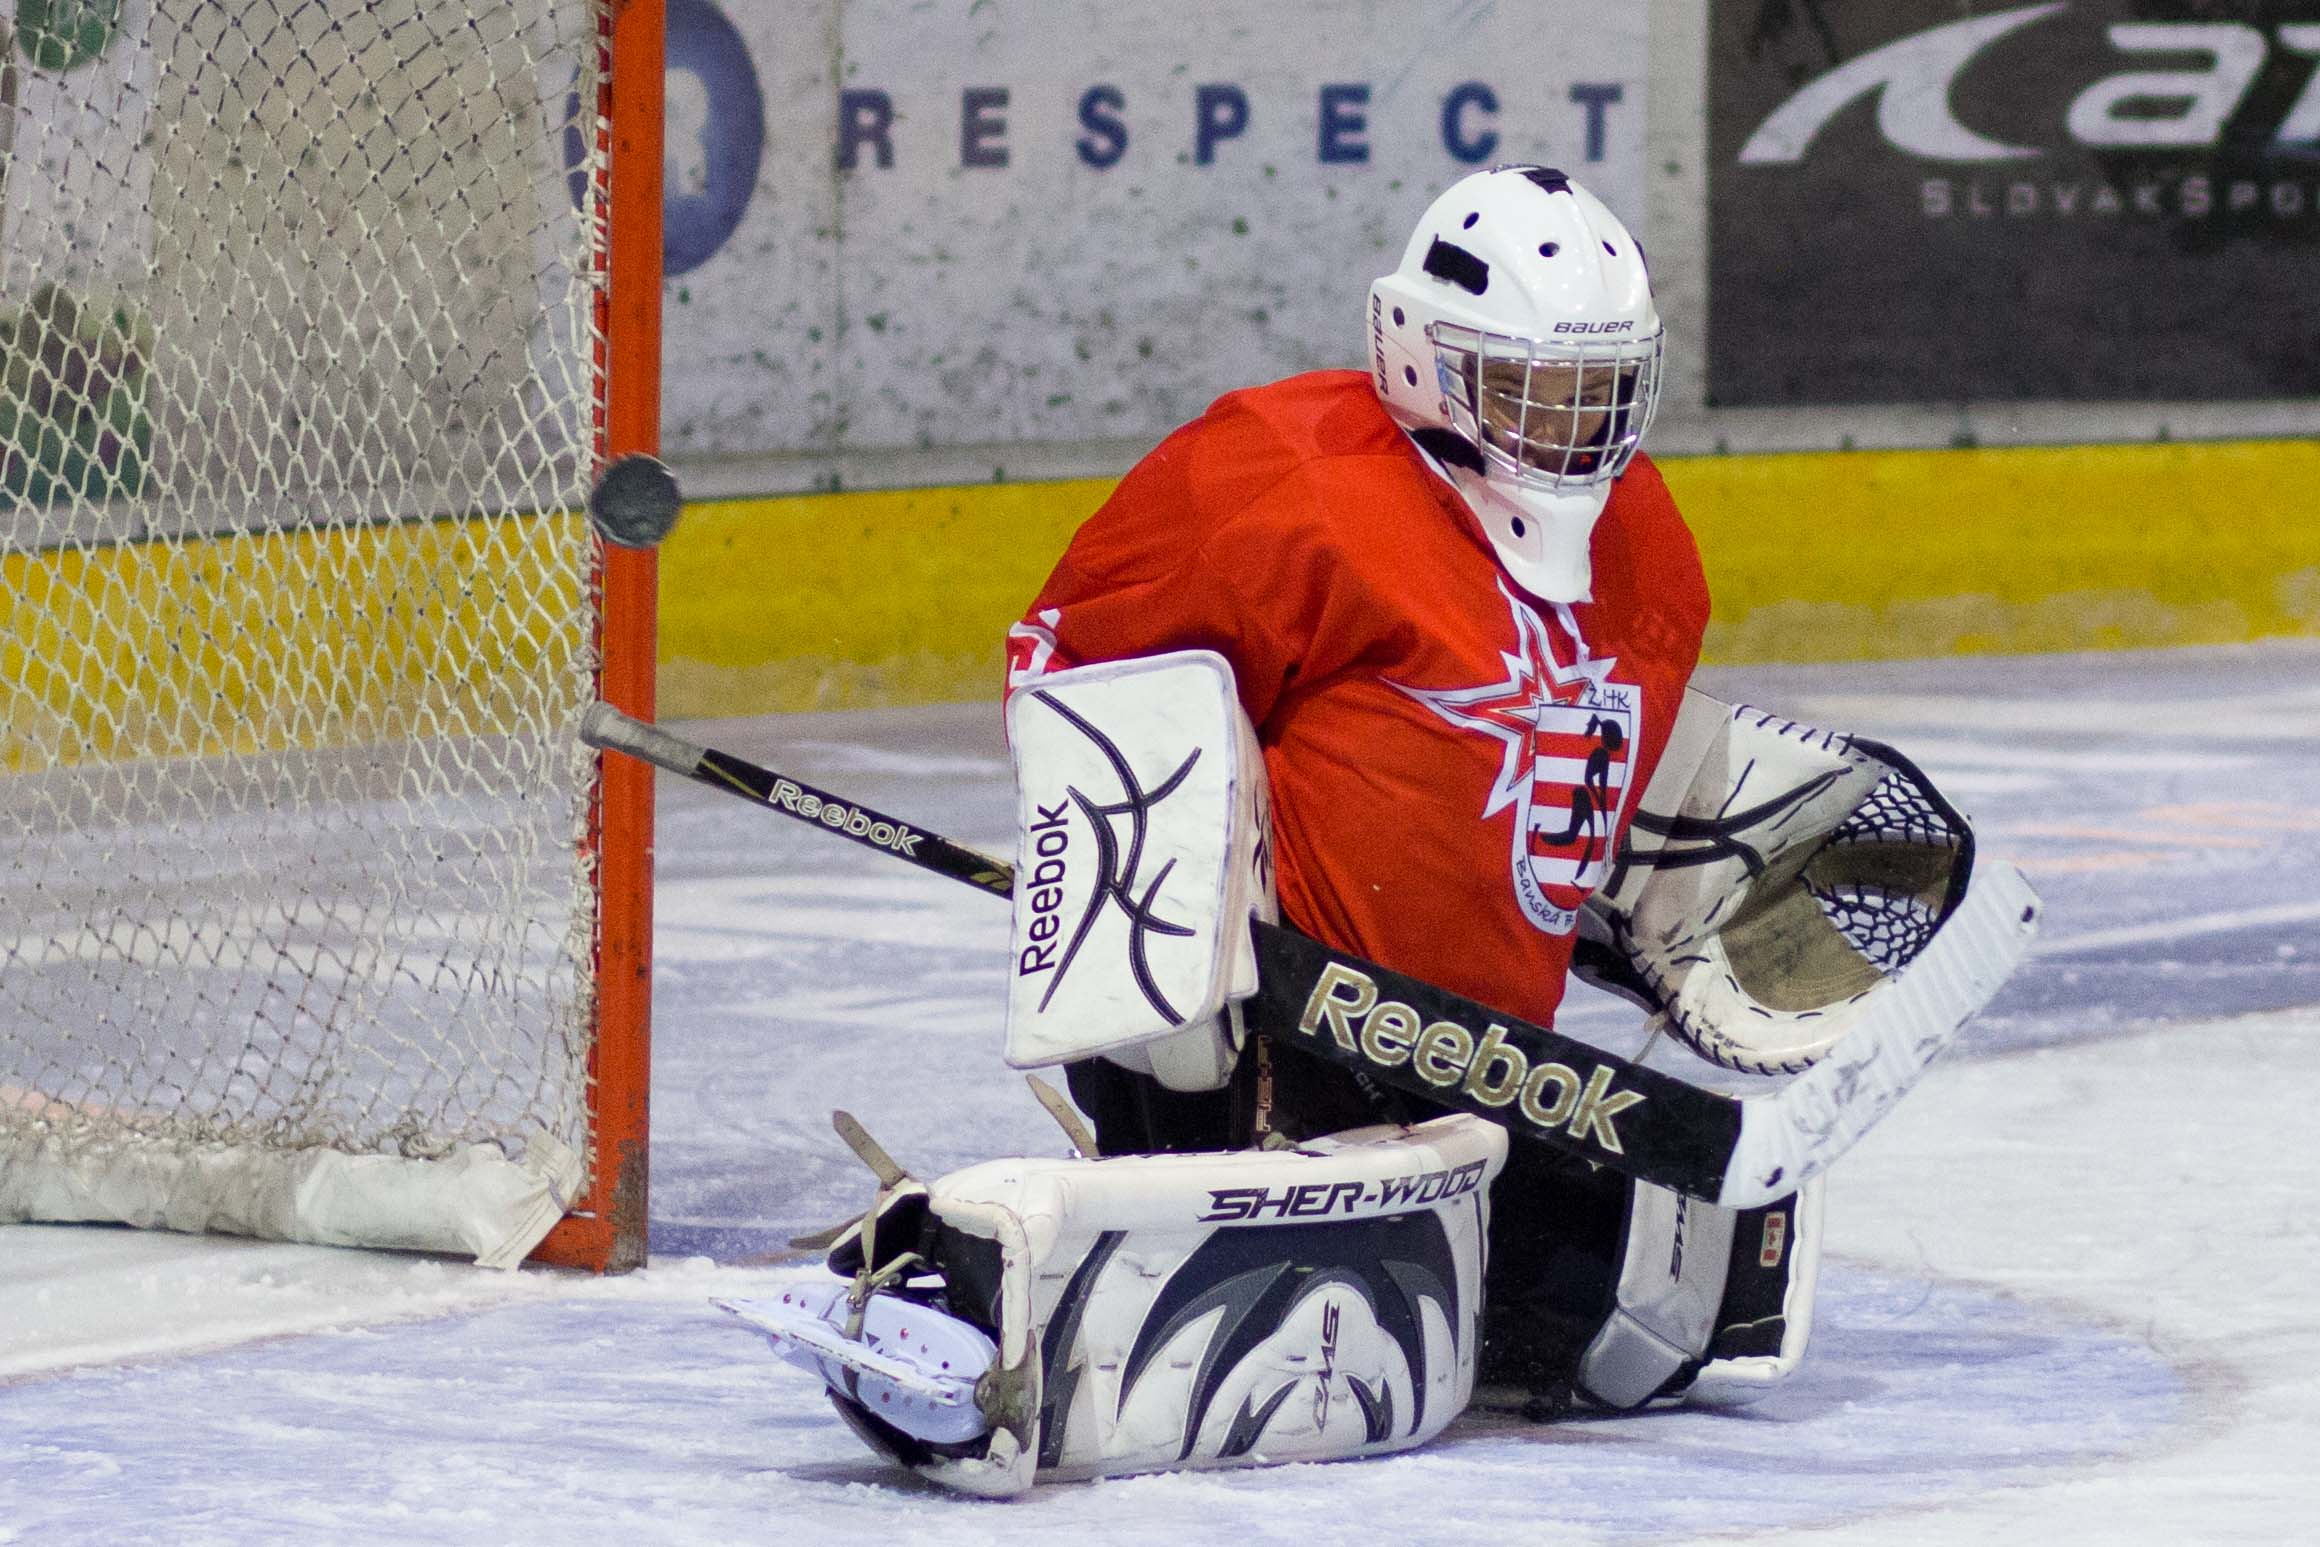 zhkm-zv-iskra-bb-2012-hokej-20